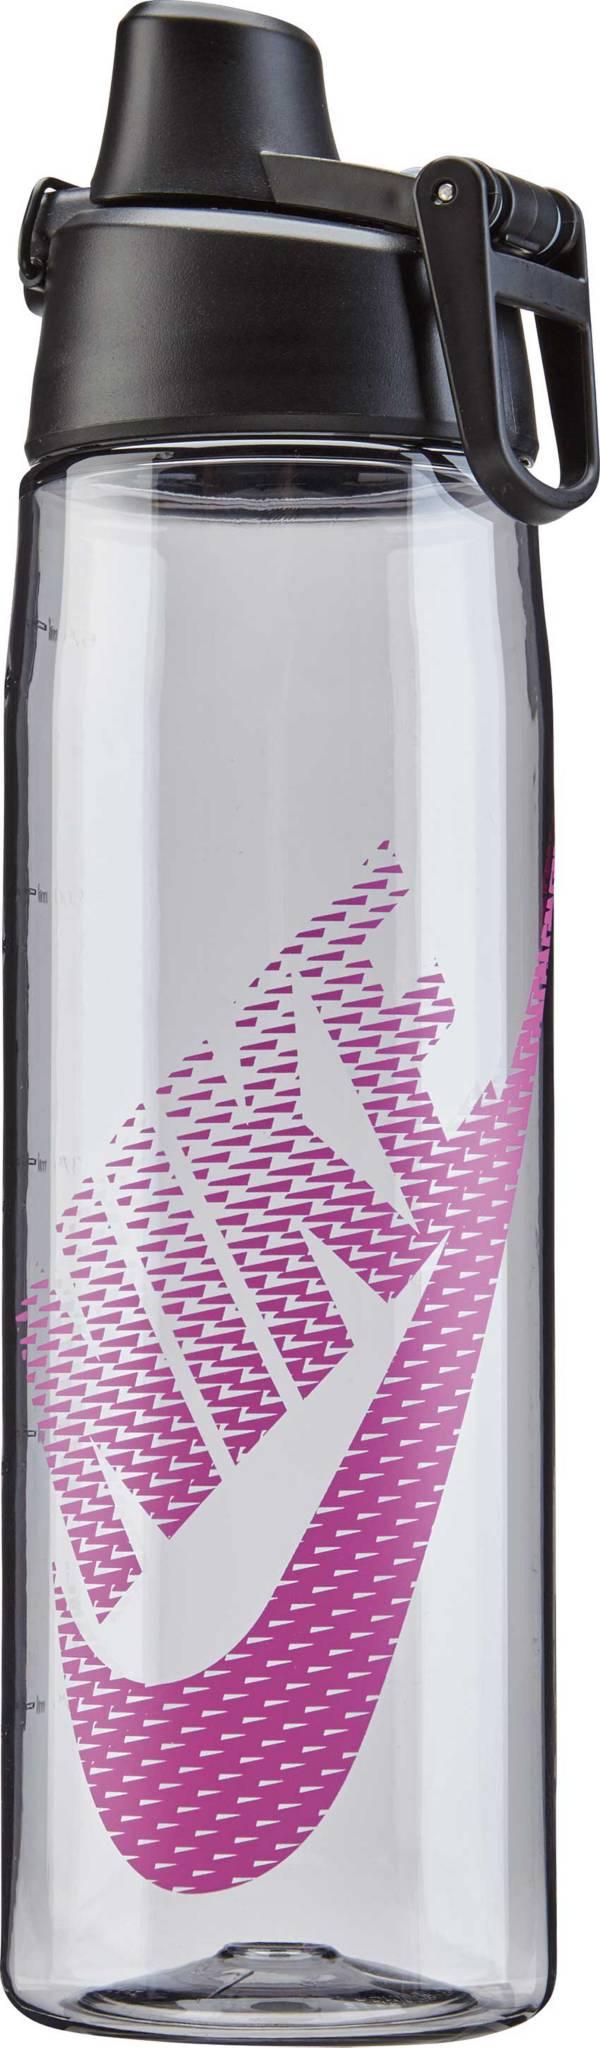 Nike Tritan 24 oz. Water Bottle product image